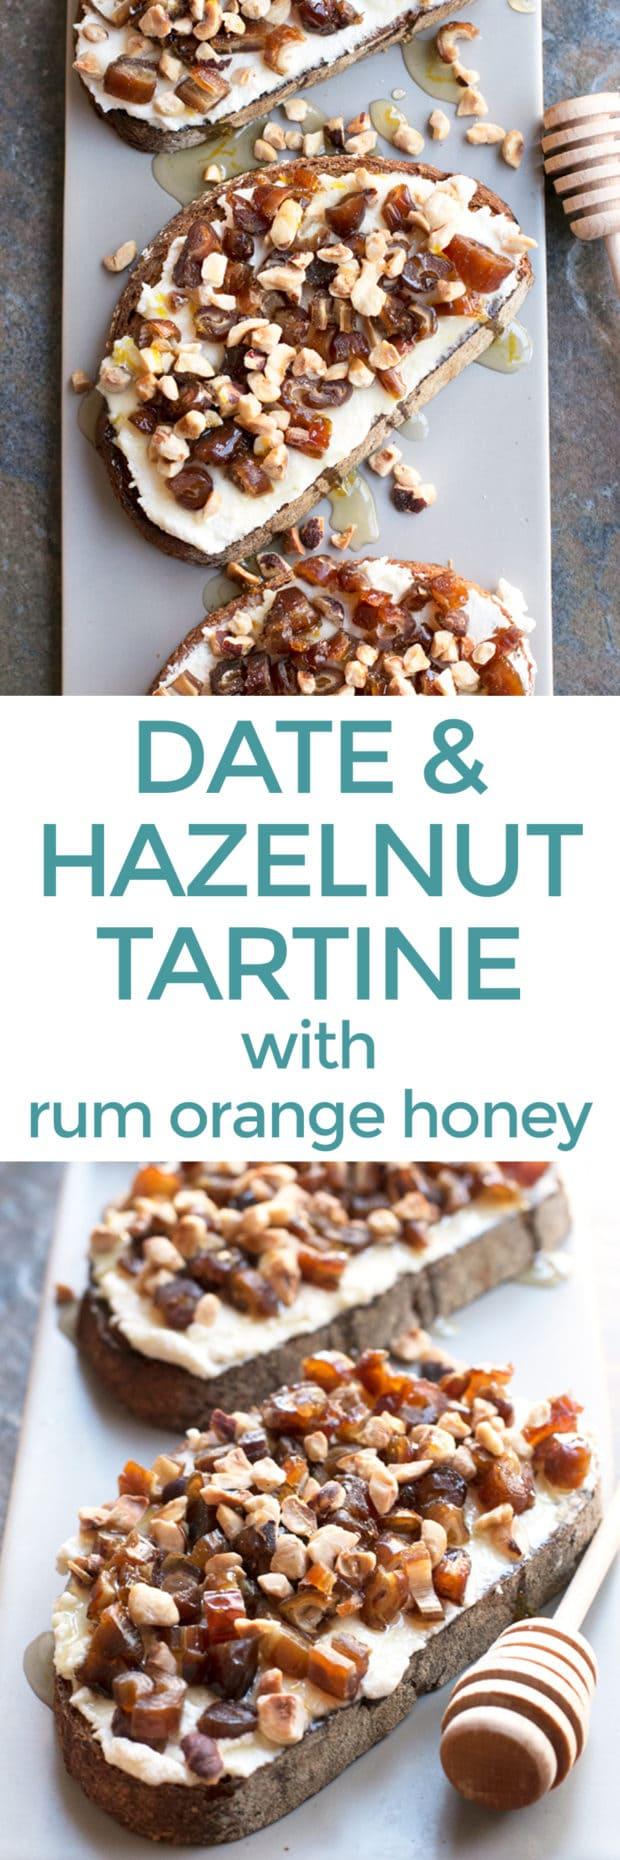 Ricotta, Date & Hazelnut Tartine with Spiced Rum Honey   cakenknife.com